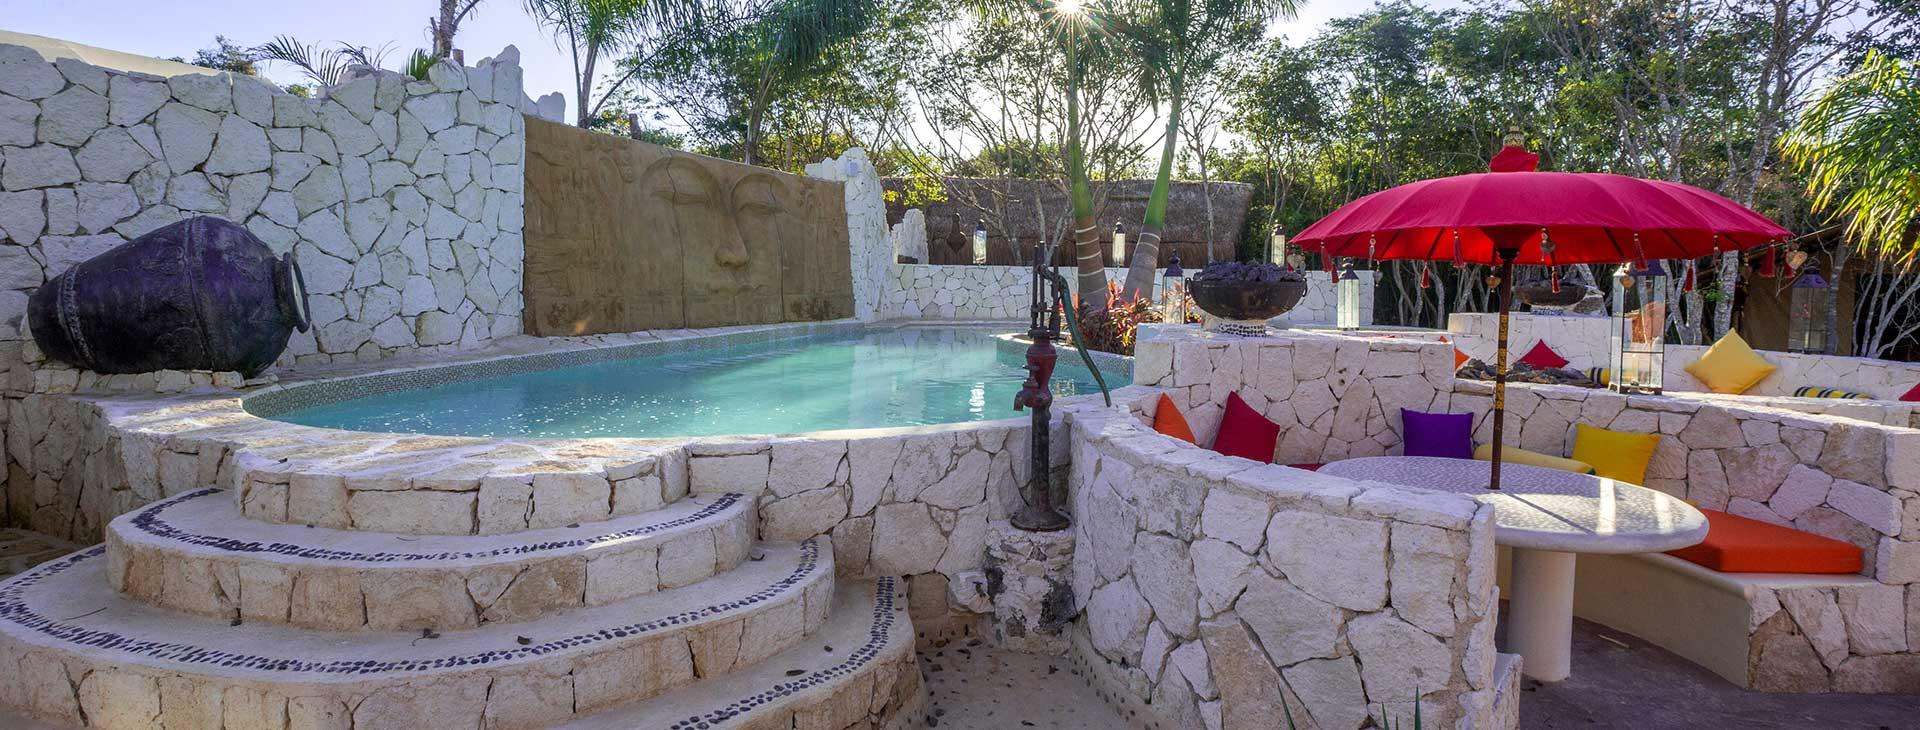 Serenity Eco Luxury Tented Camp